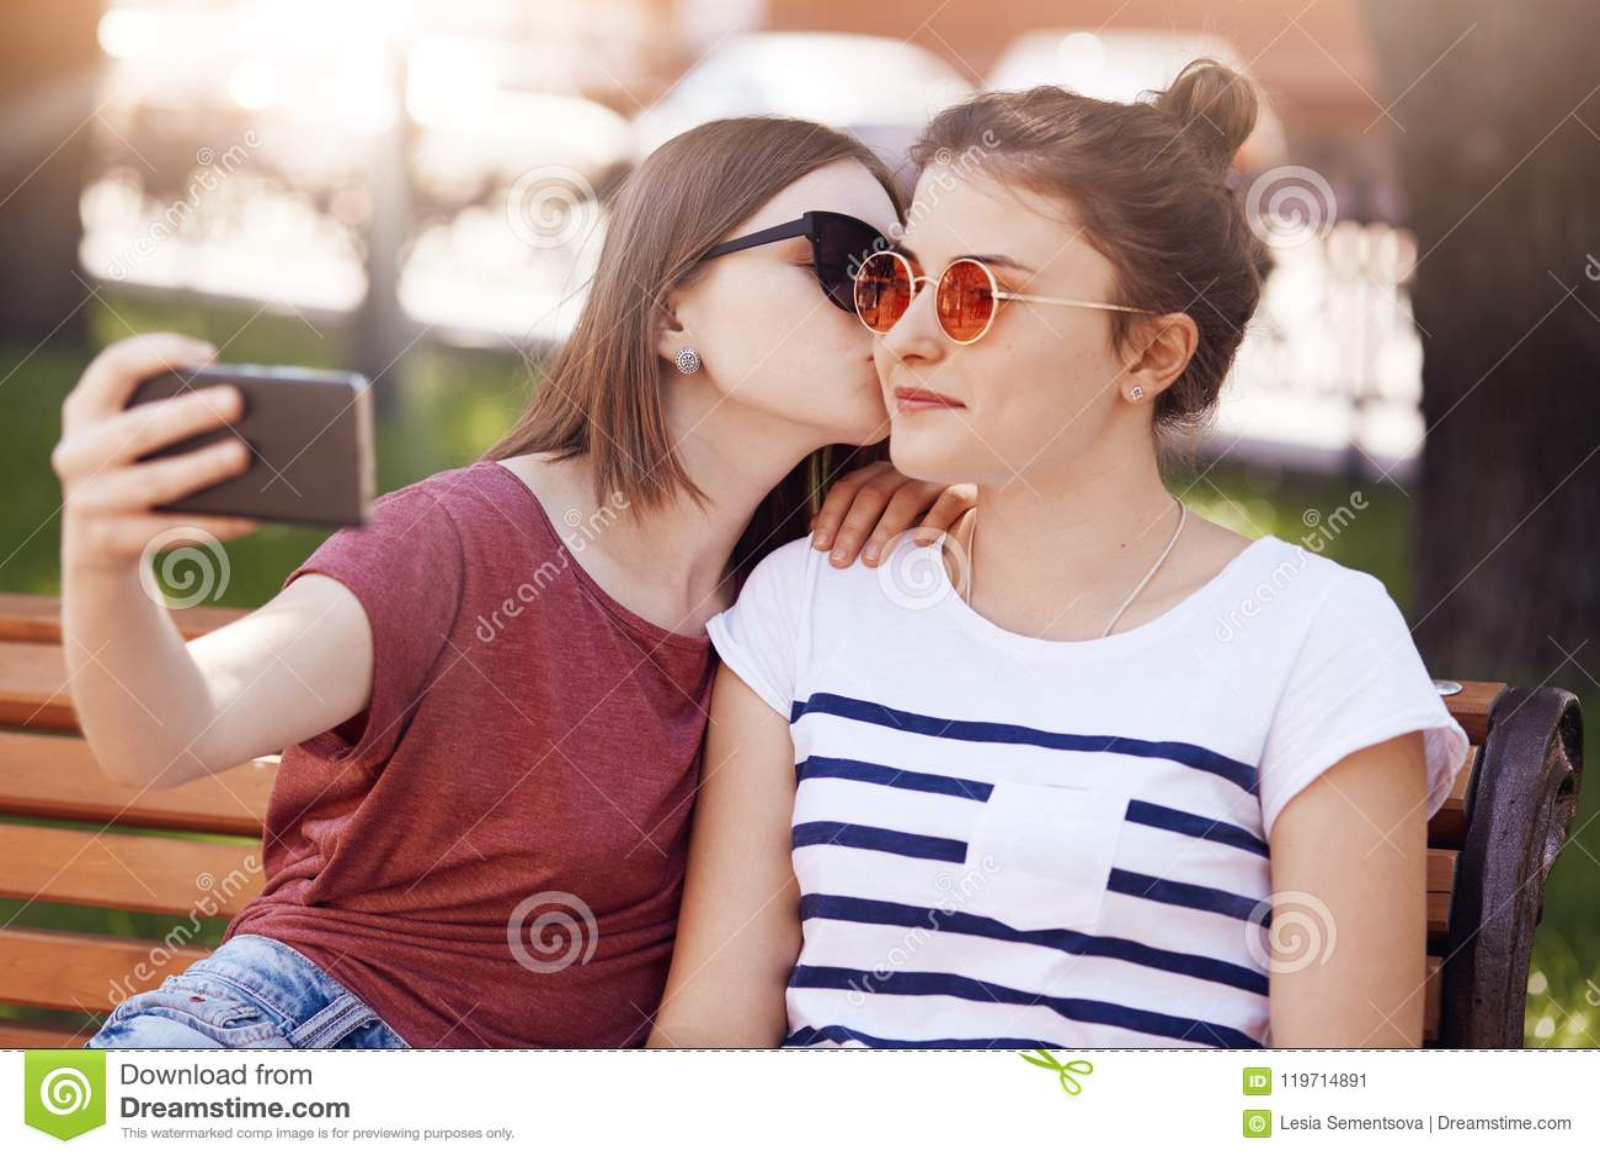 lesbiche ragazze baci video